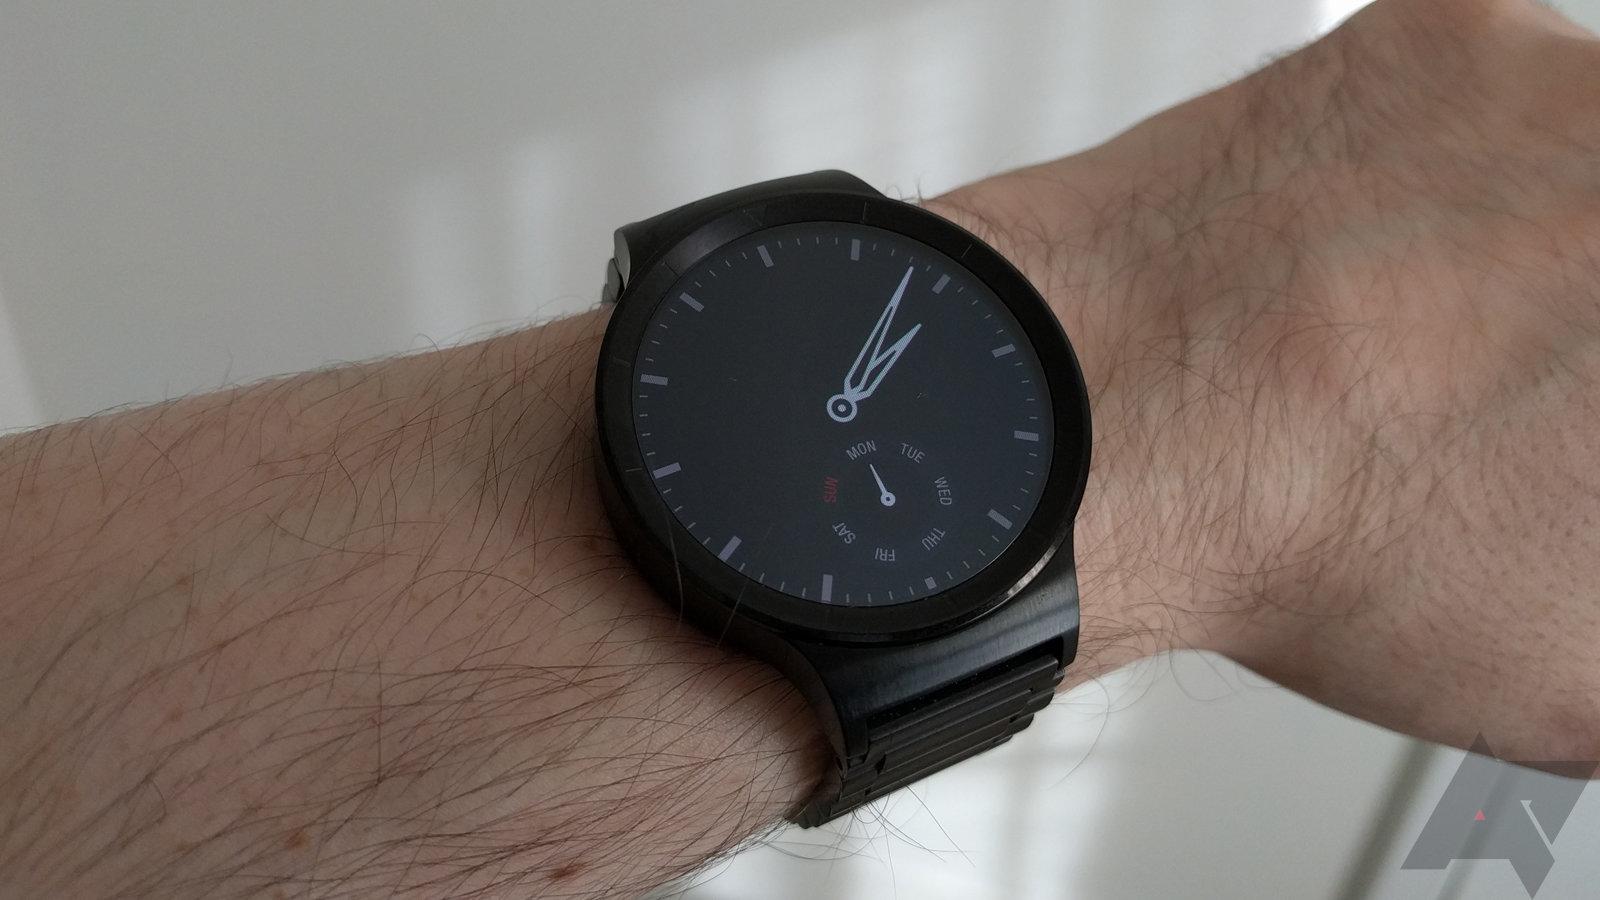 Huawei Watch Vs Moto 360 V2 Which One Belongs On Your Wrist Smart Black Stainless Steel Wm 2015 11 02 140832